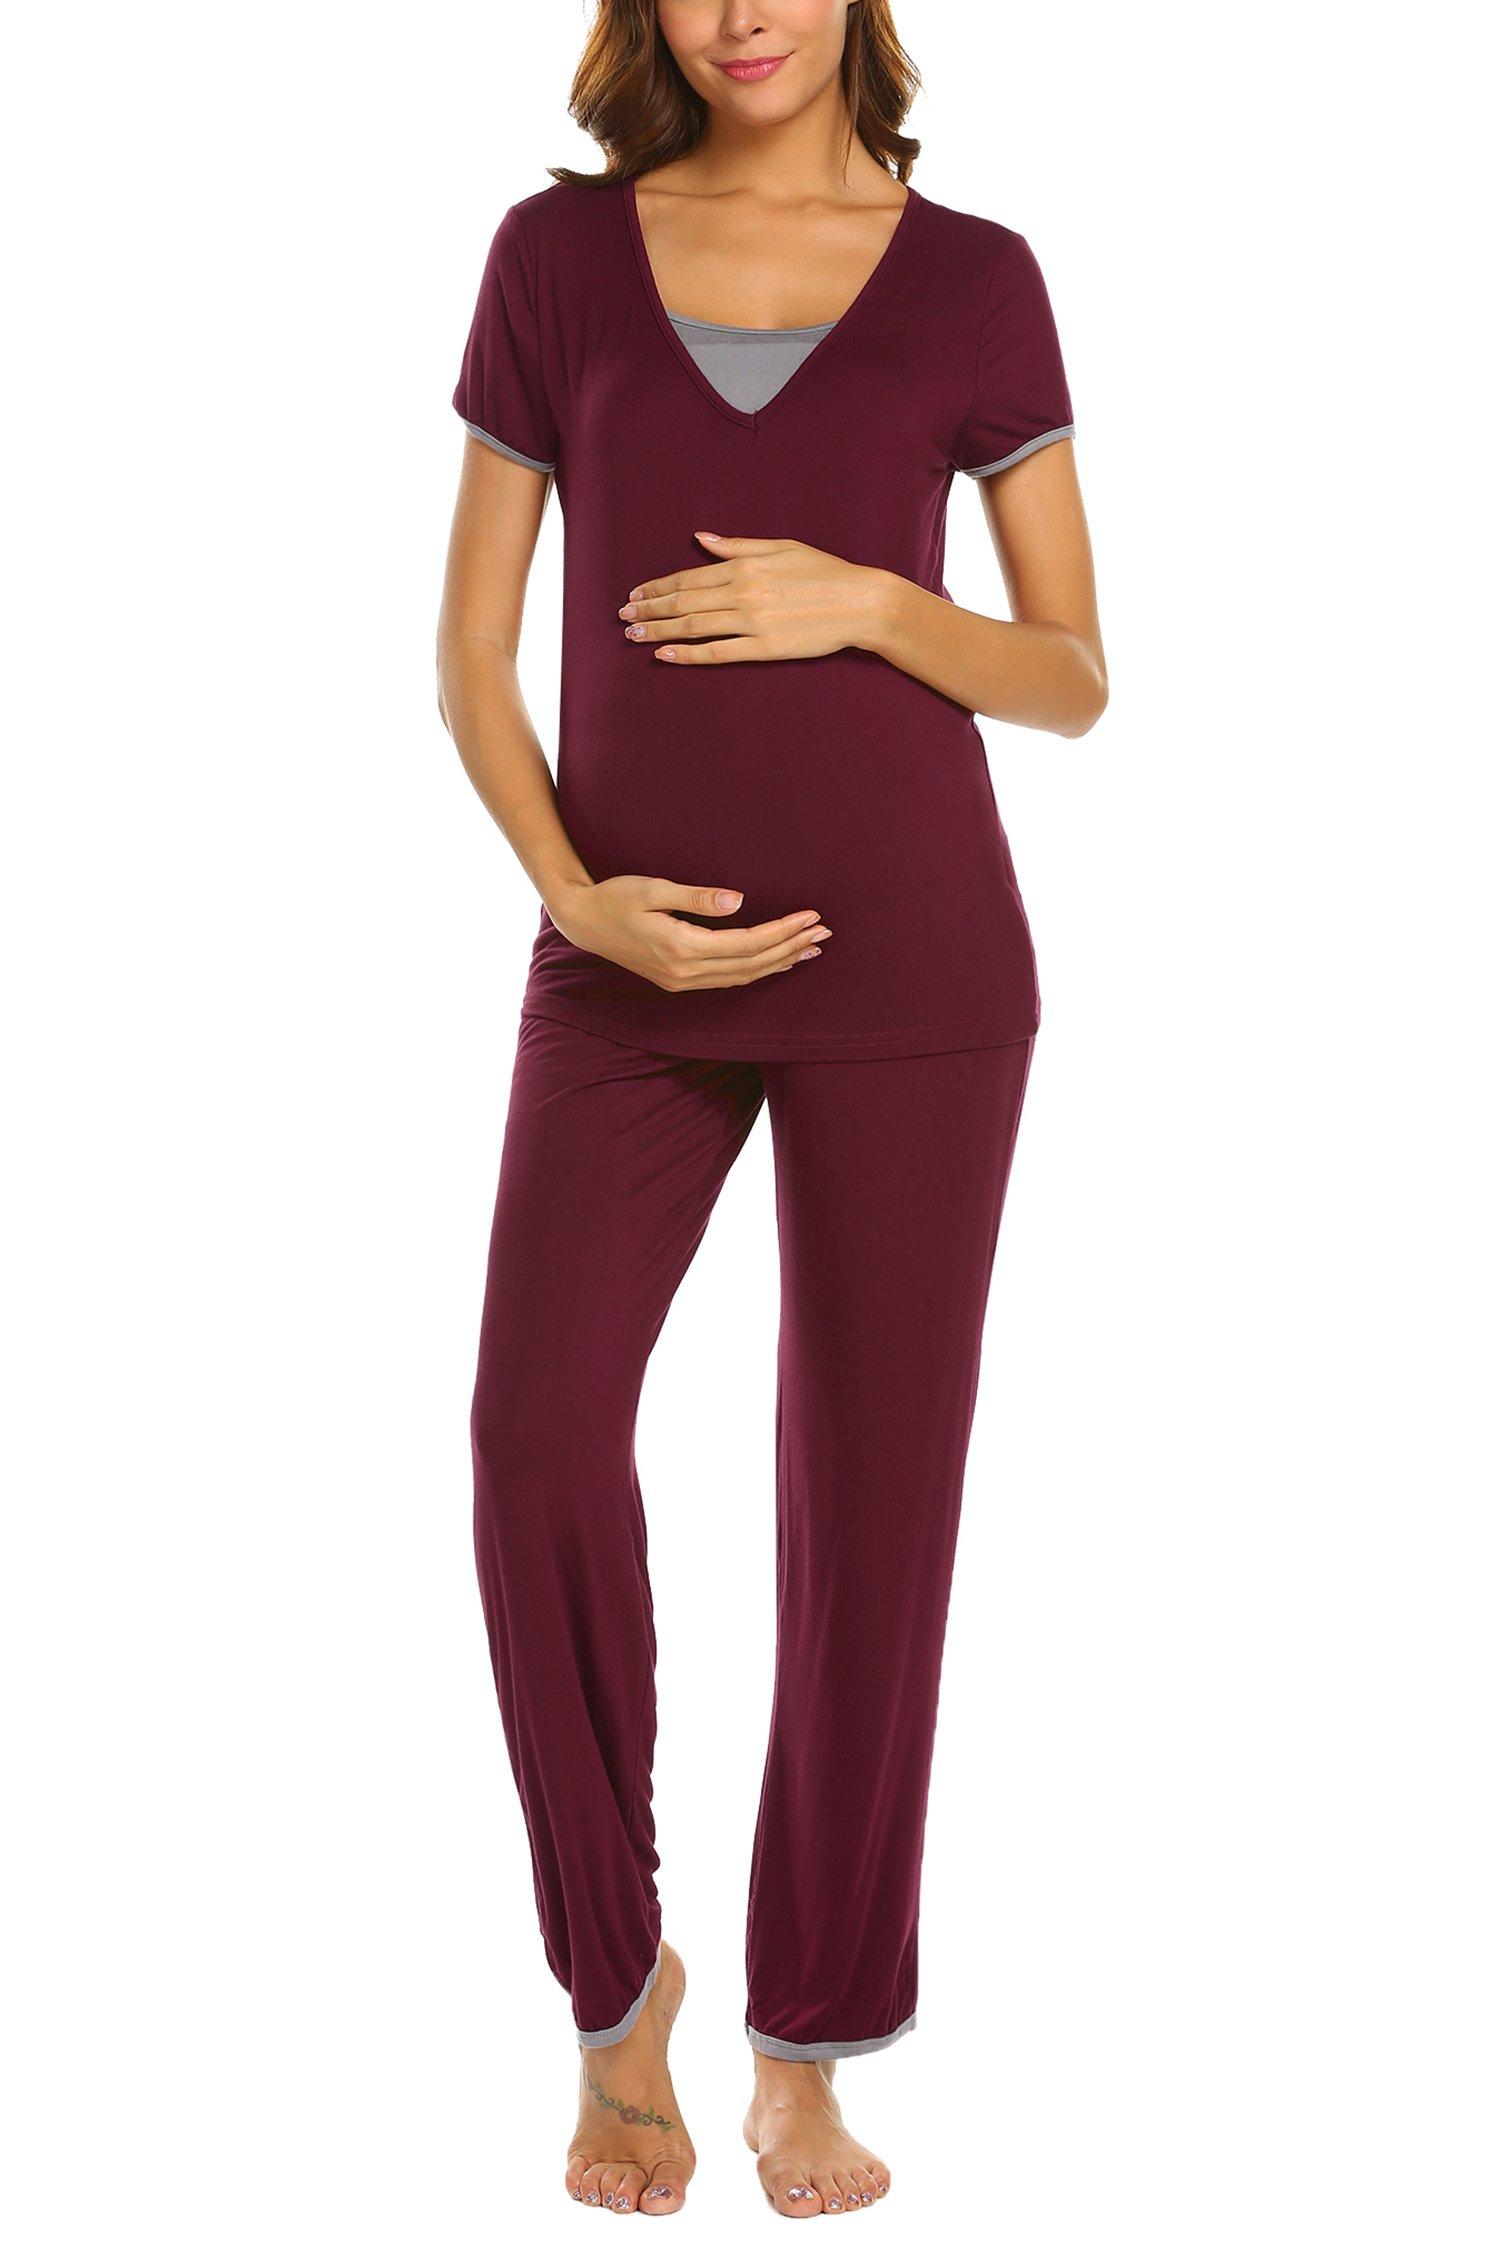 Ekouaer 3/4 Sleeve Maternity Pajama Sets for Hospital Double Layer Woman Nursing Sleepwear Set for Breastfeeding